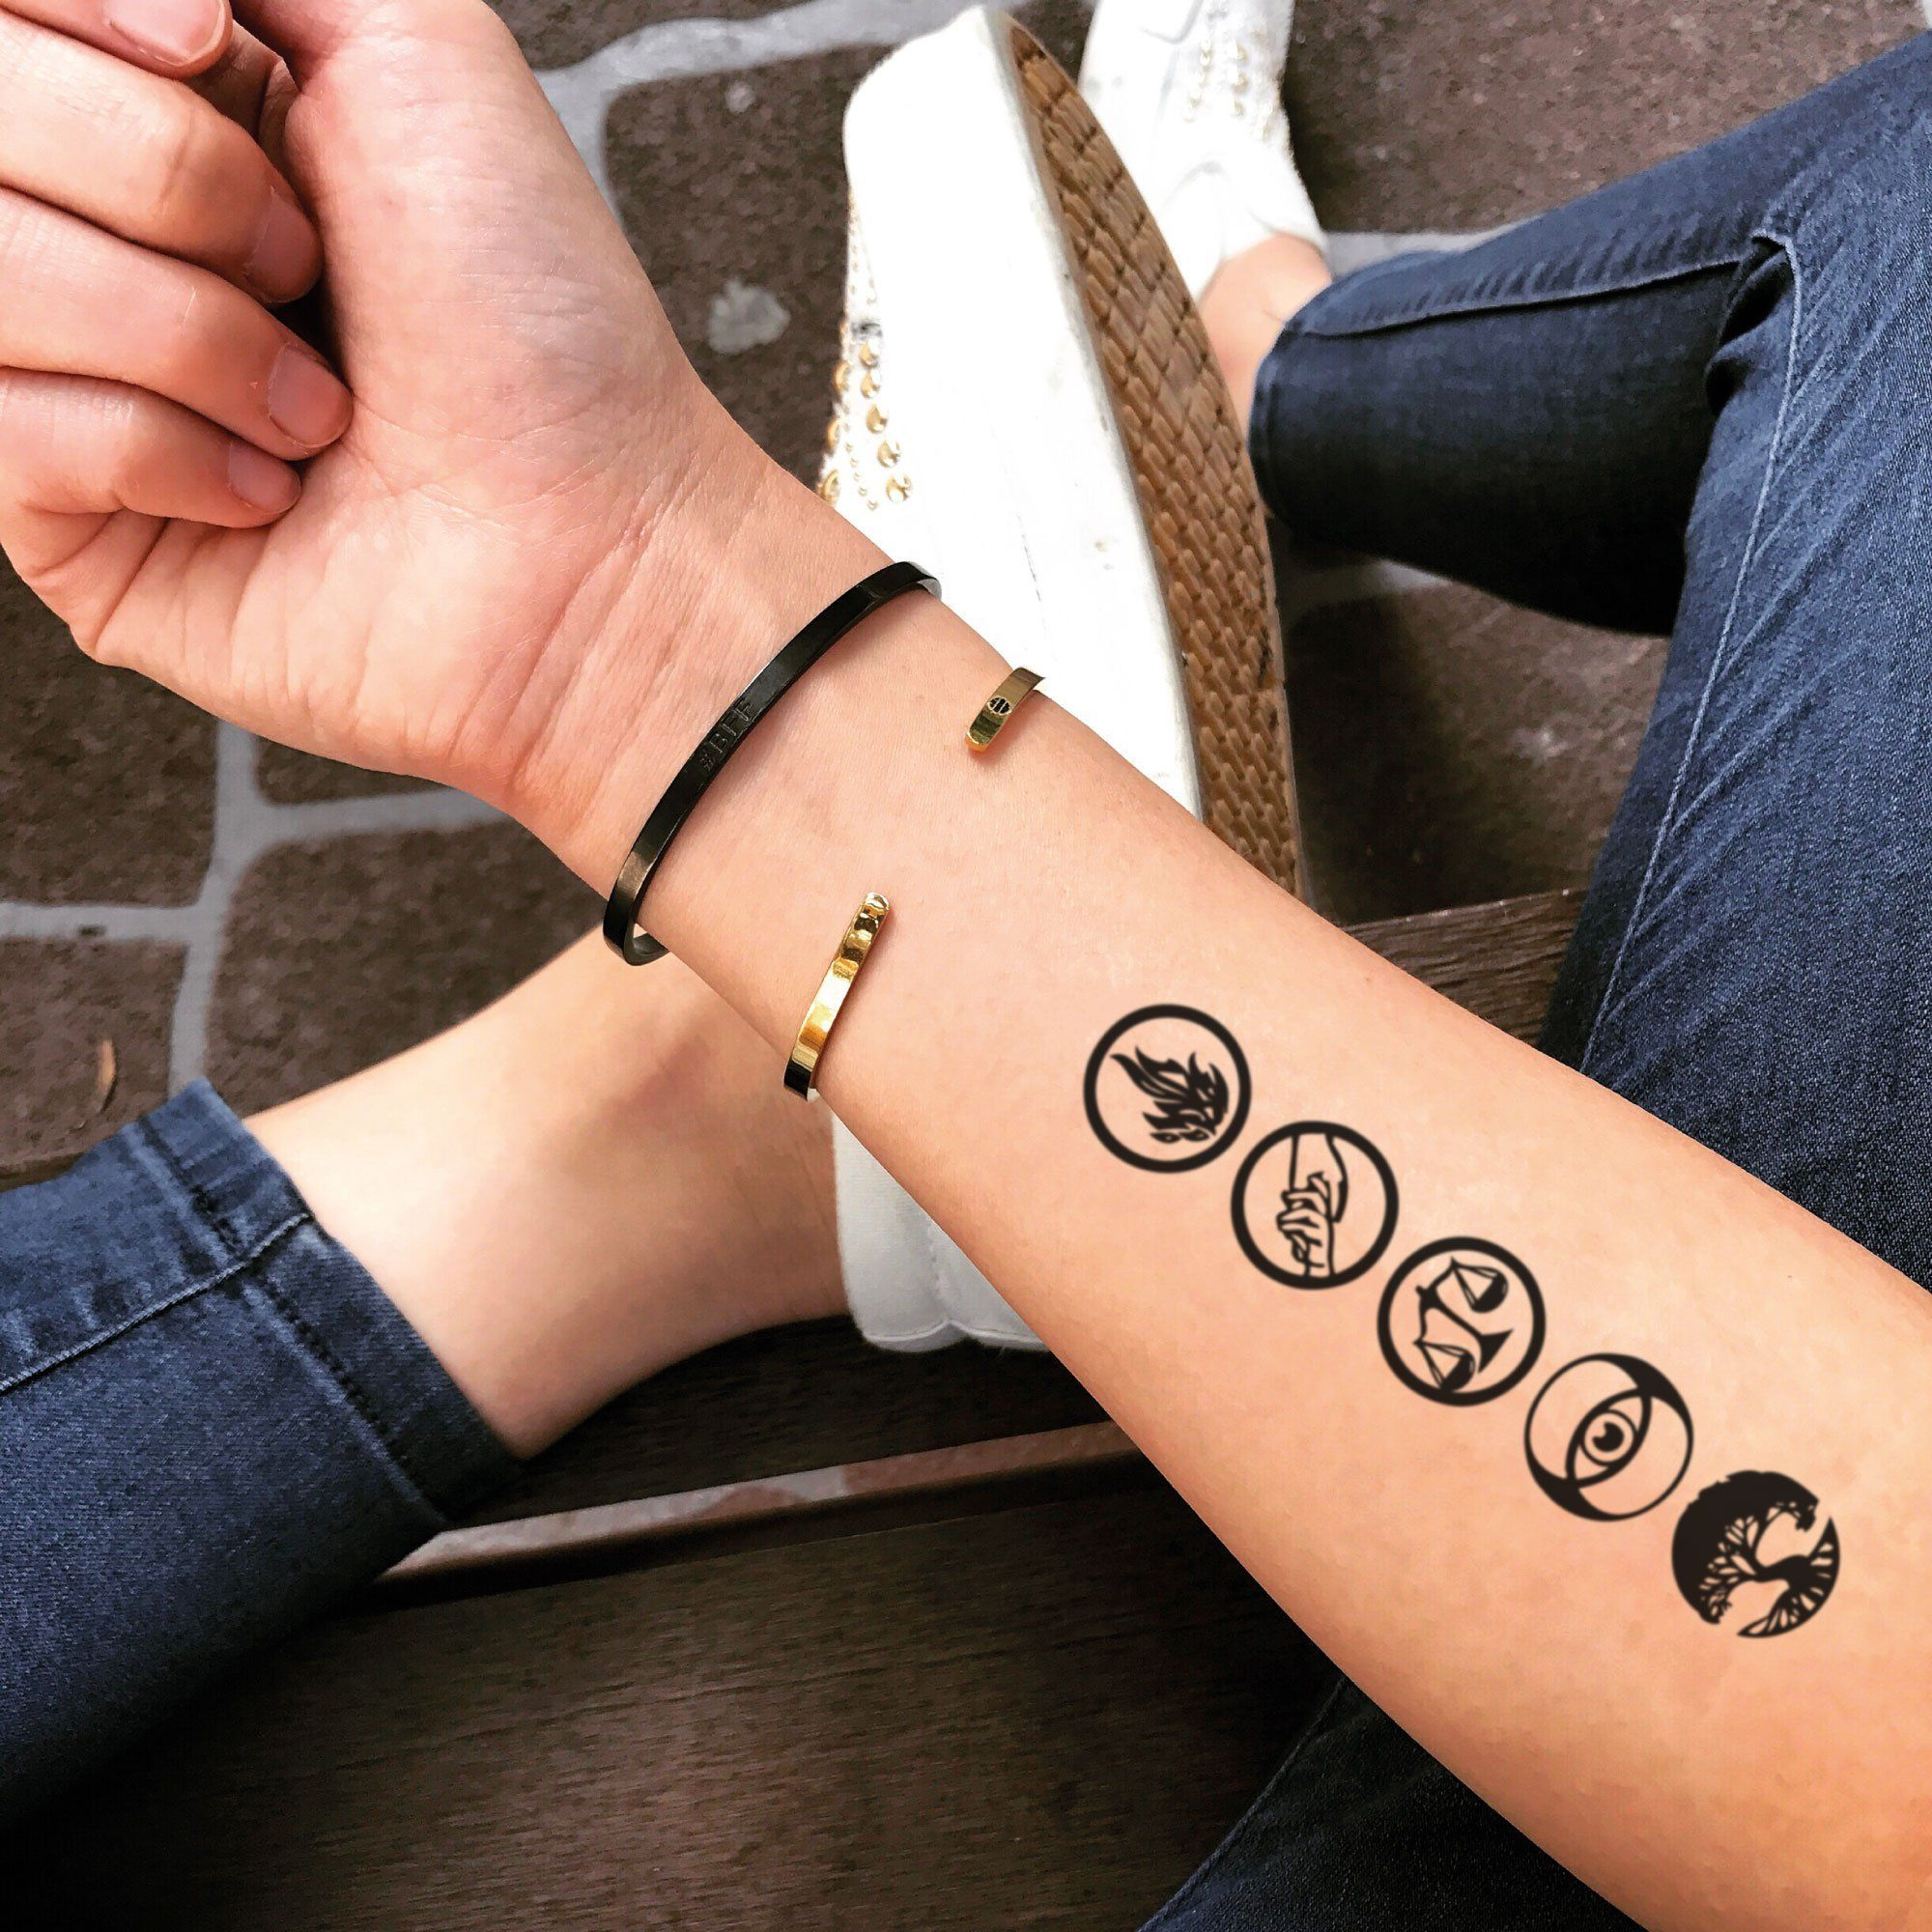 Divergent Four Dauntless Temporary Tattoo Sticker (Set of 2)